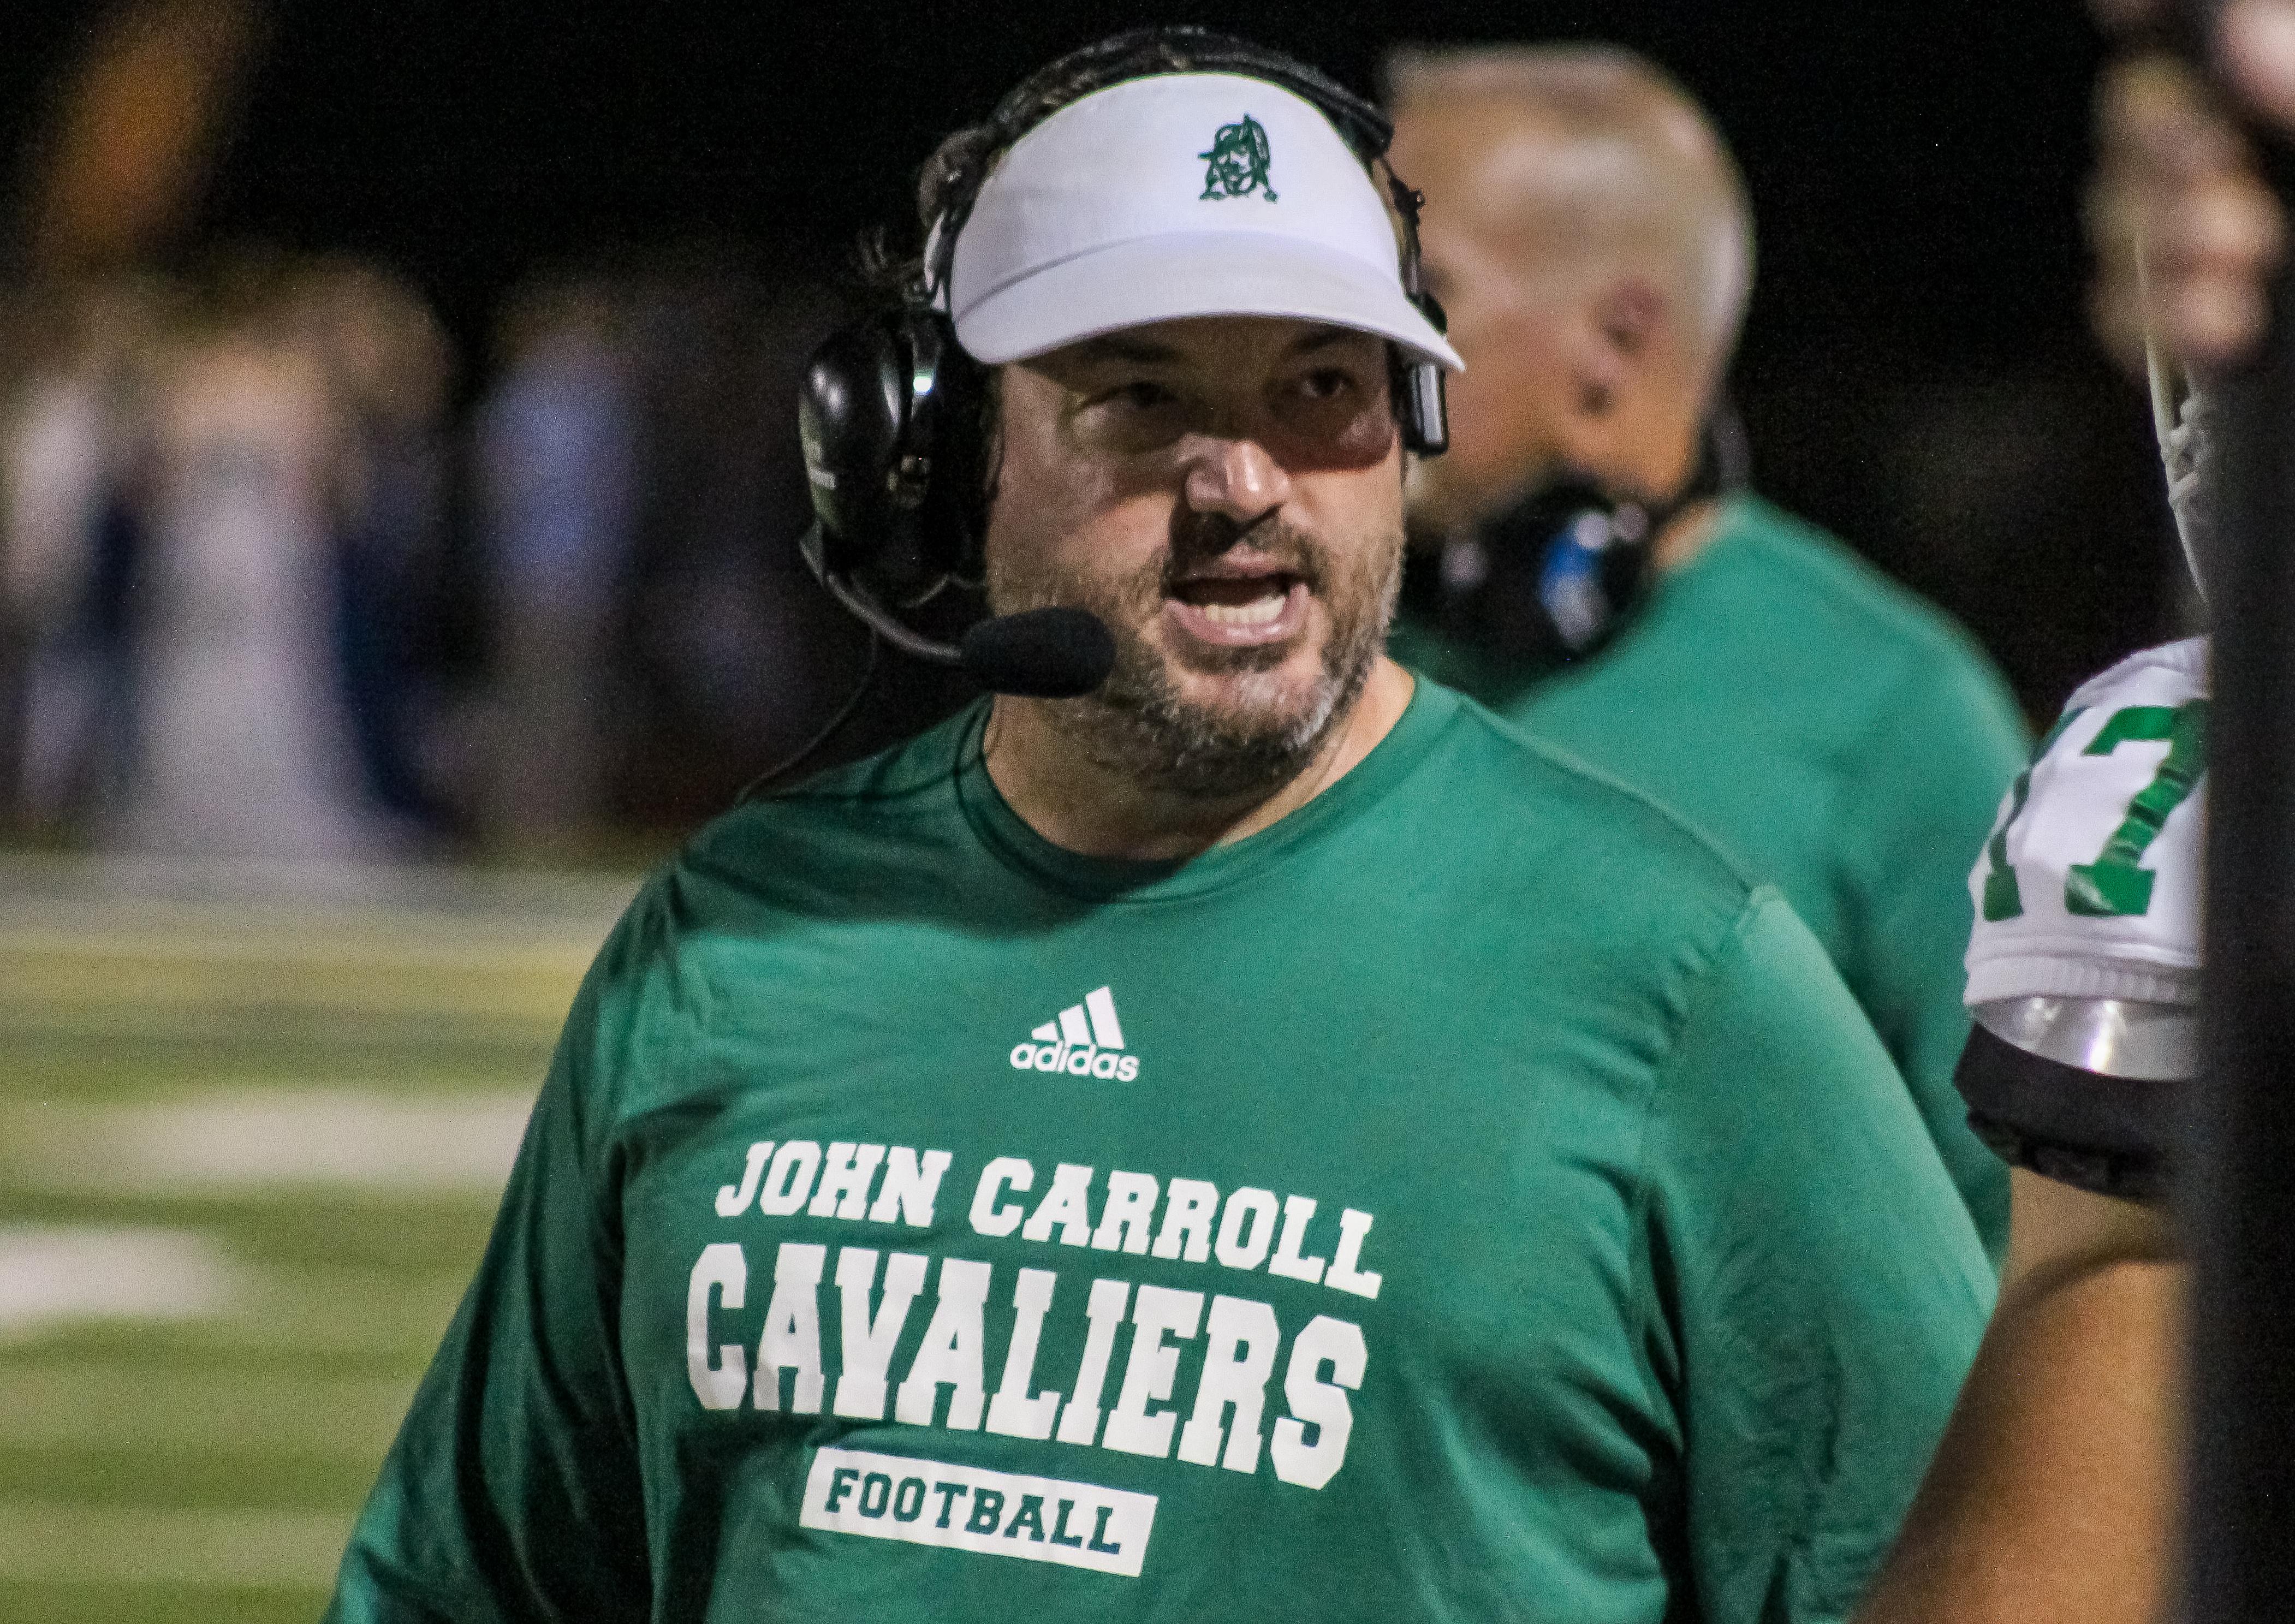 John Carroll head coach Logan Colafrancisco